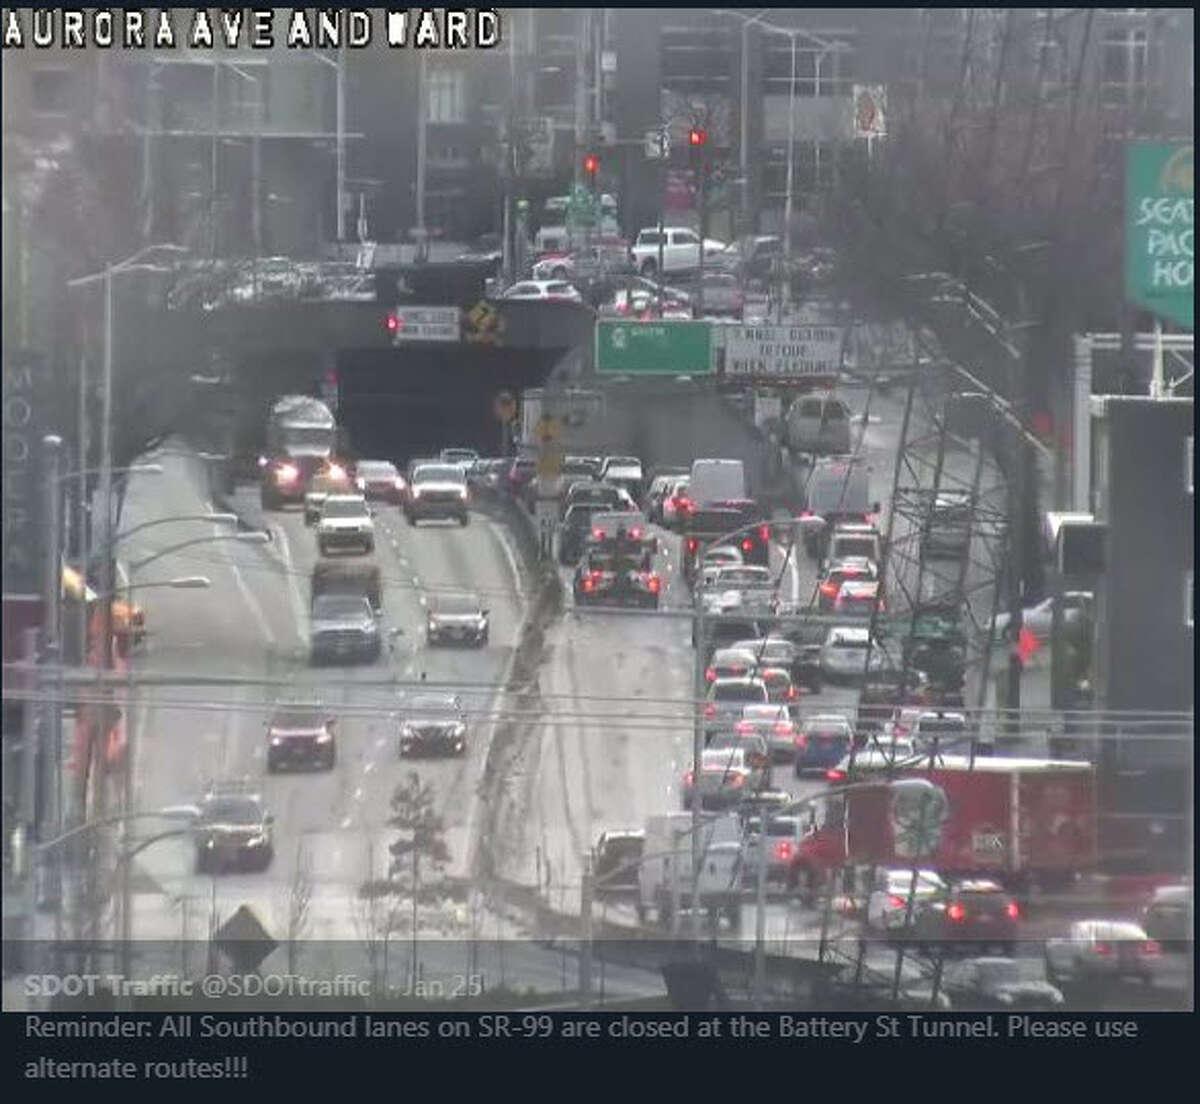 Alaskan Way Viaduct crash that closes southbound lanes Jan. 25, 2018.